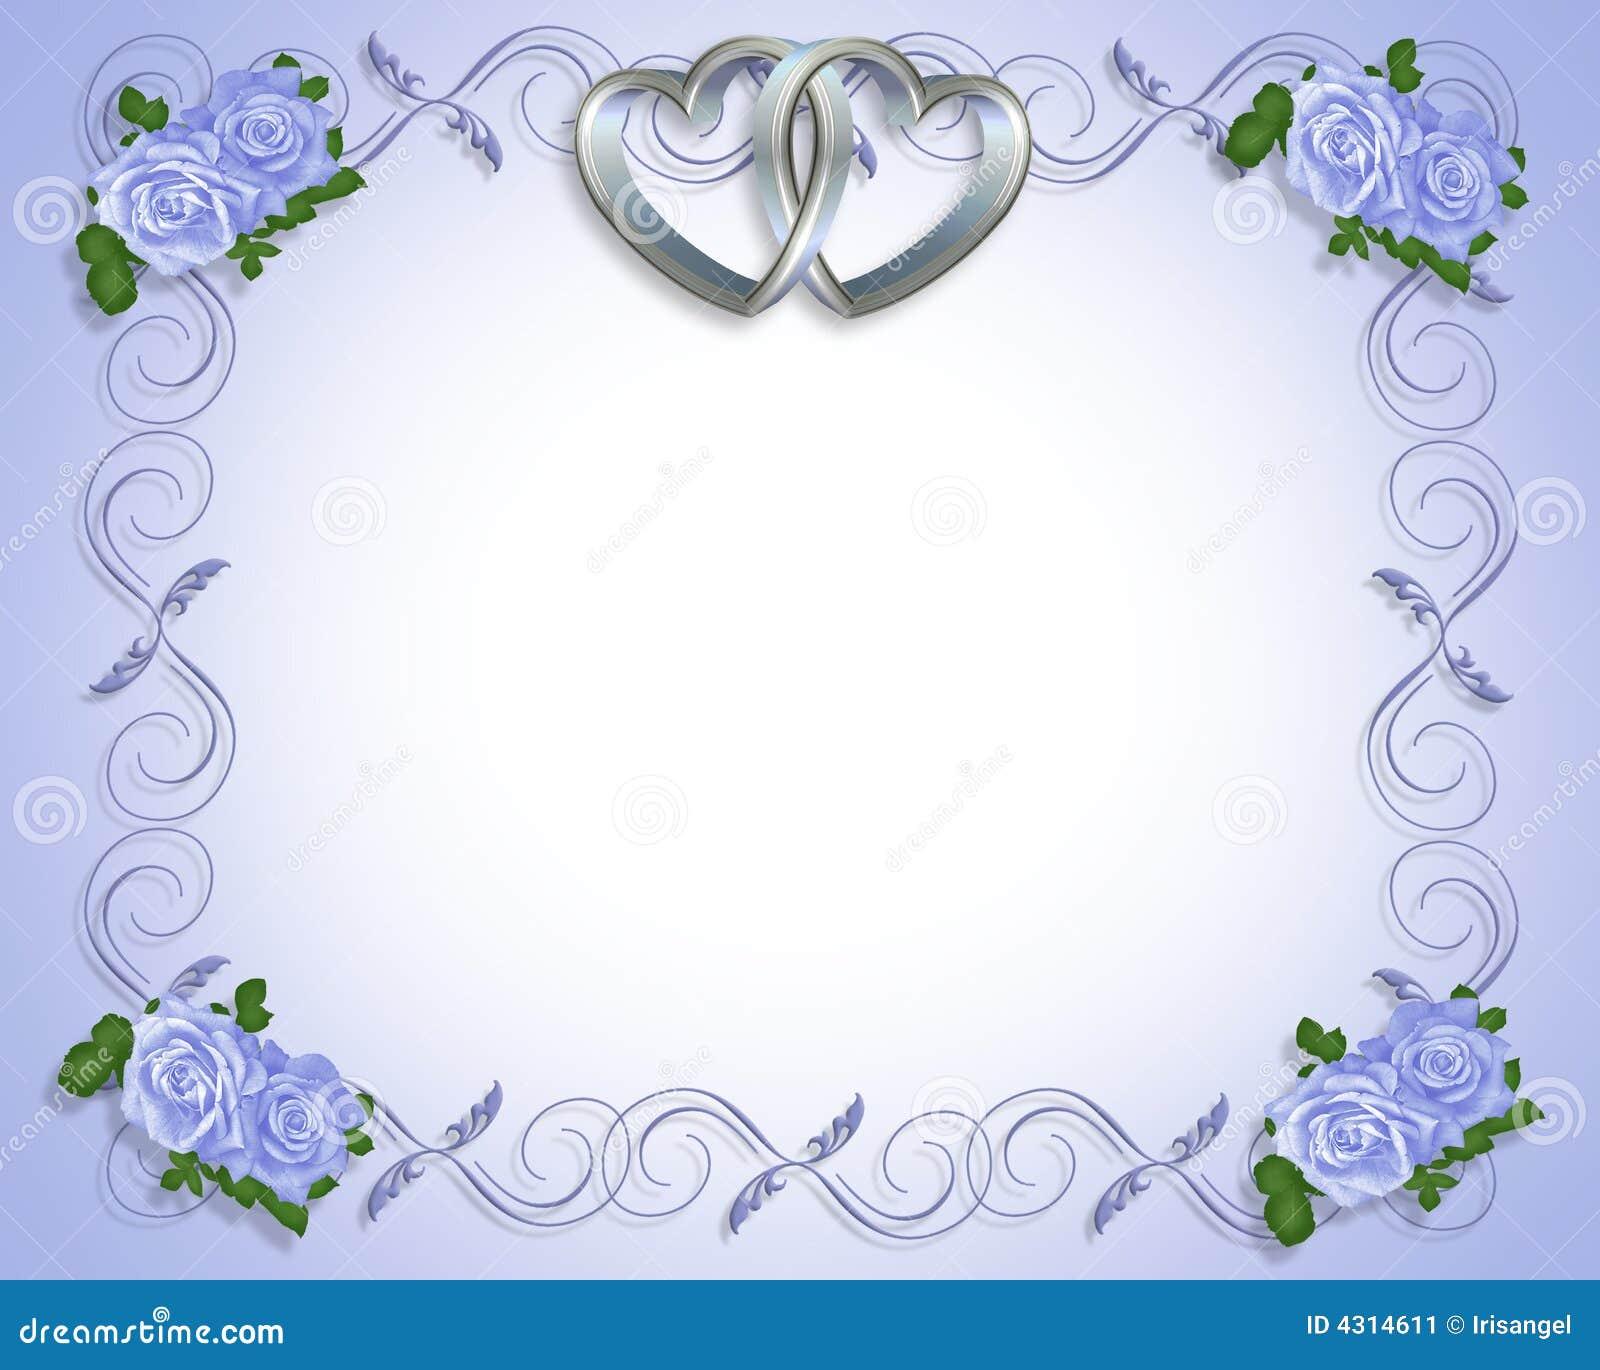 25th Wedding Anniversary Invitations 003 - 25th Wedding Anniversary Invitations